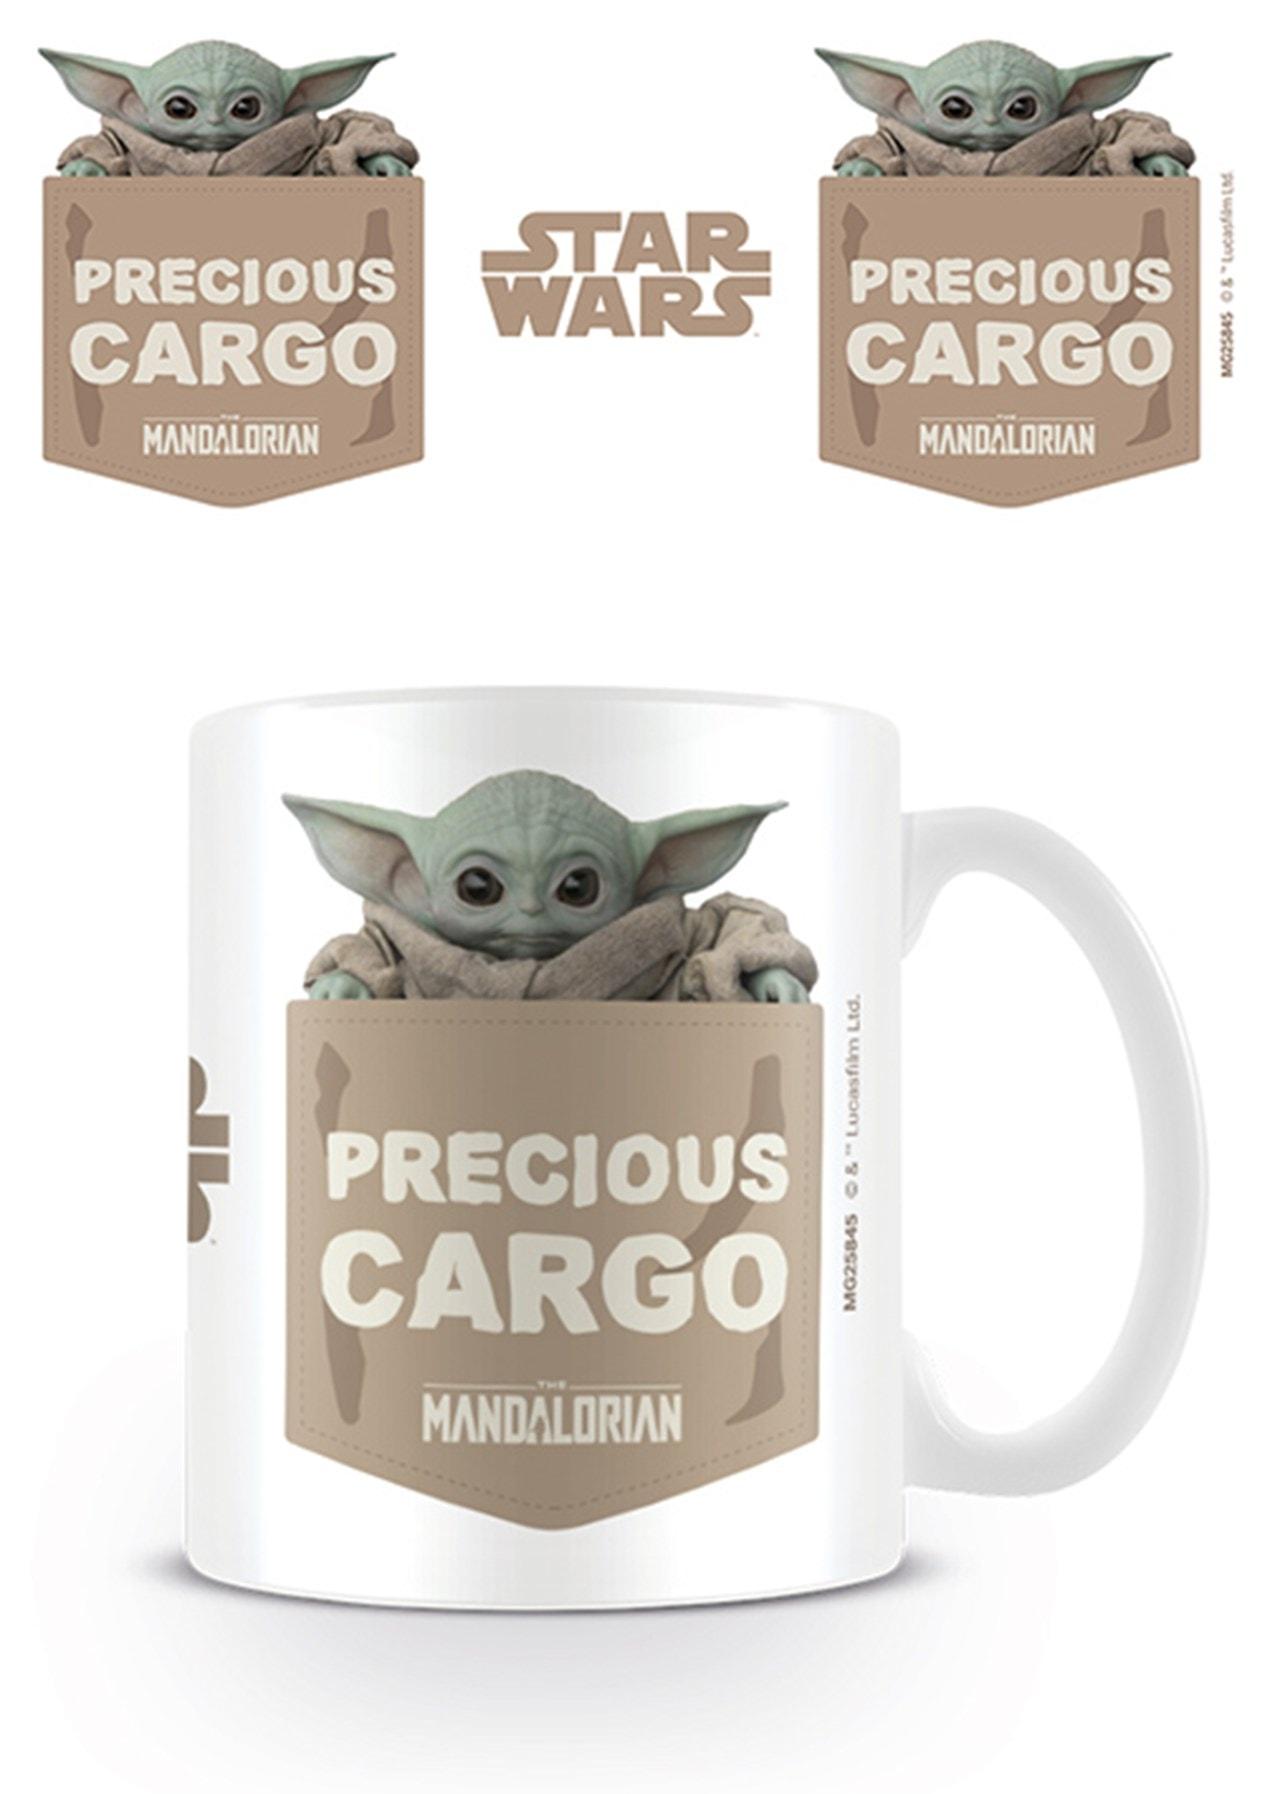 Mug Star Wars: The Mandalorian: Baby Yoda (Precious Cargo) - 1